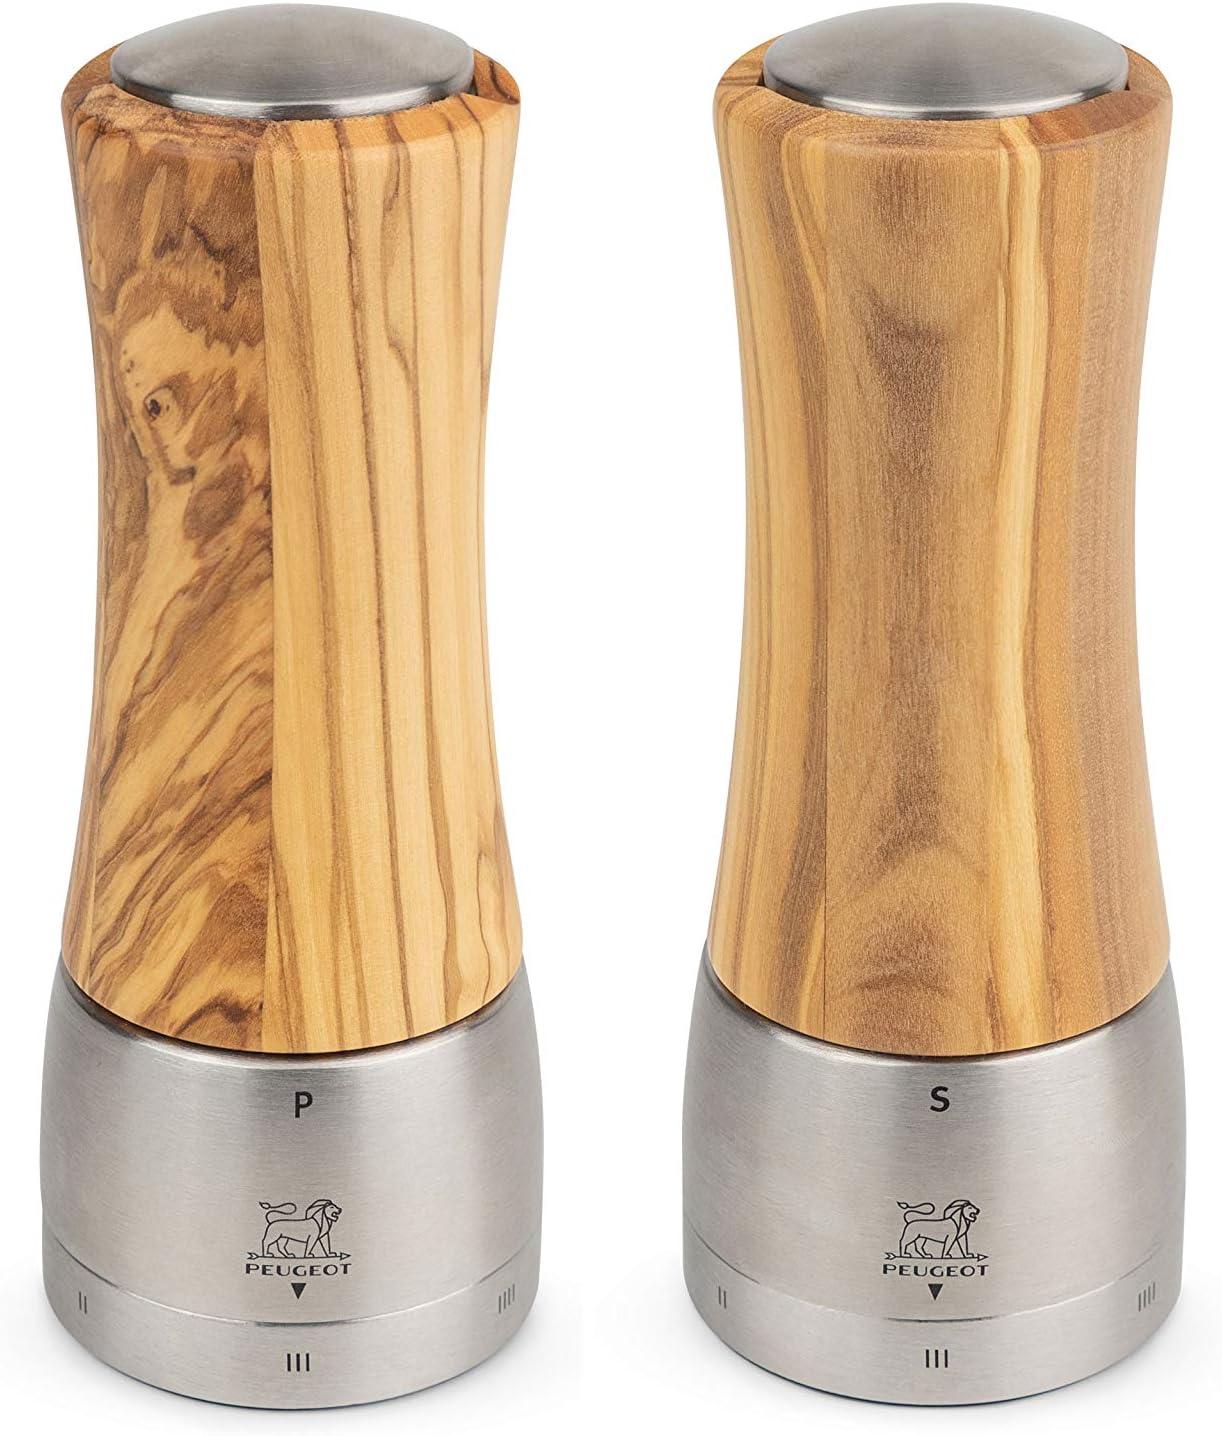 Peugeot Madras Ranking TOP12 u'Select Olive In stock Wood Set Mill Pepper Salt